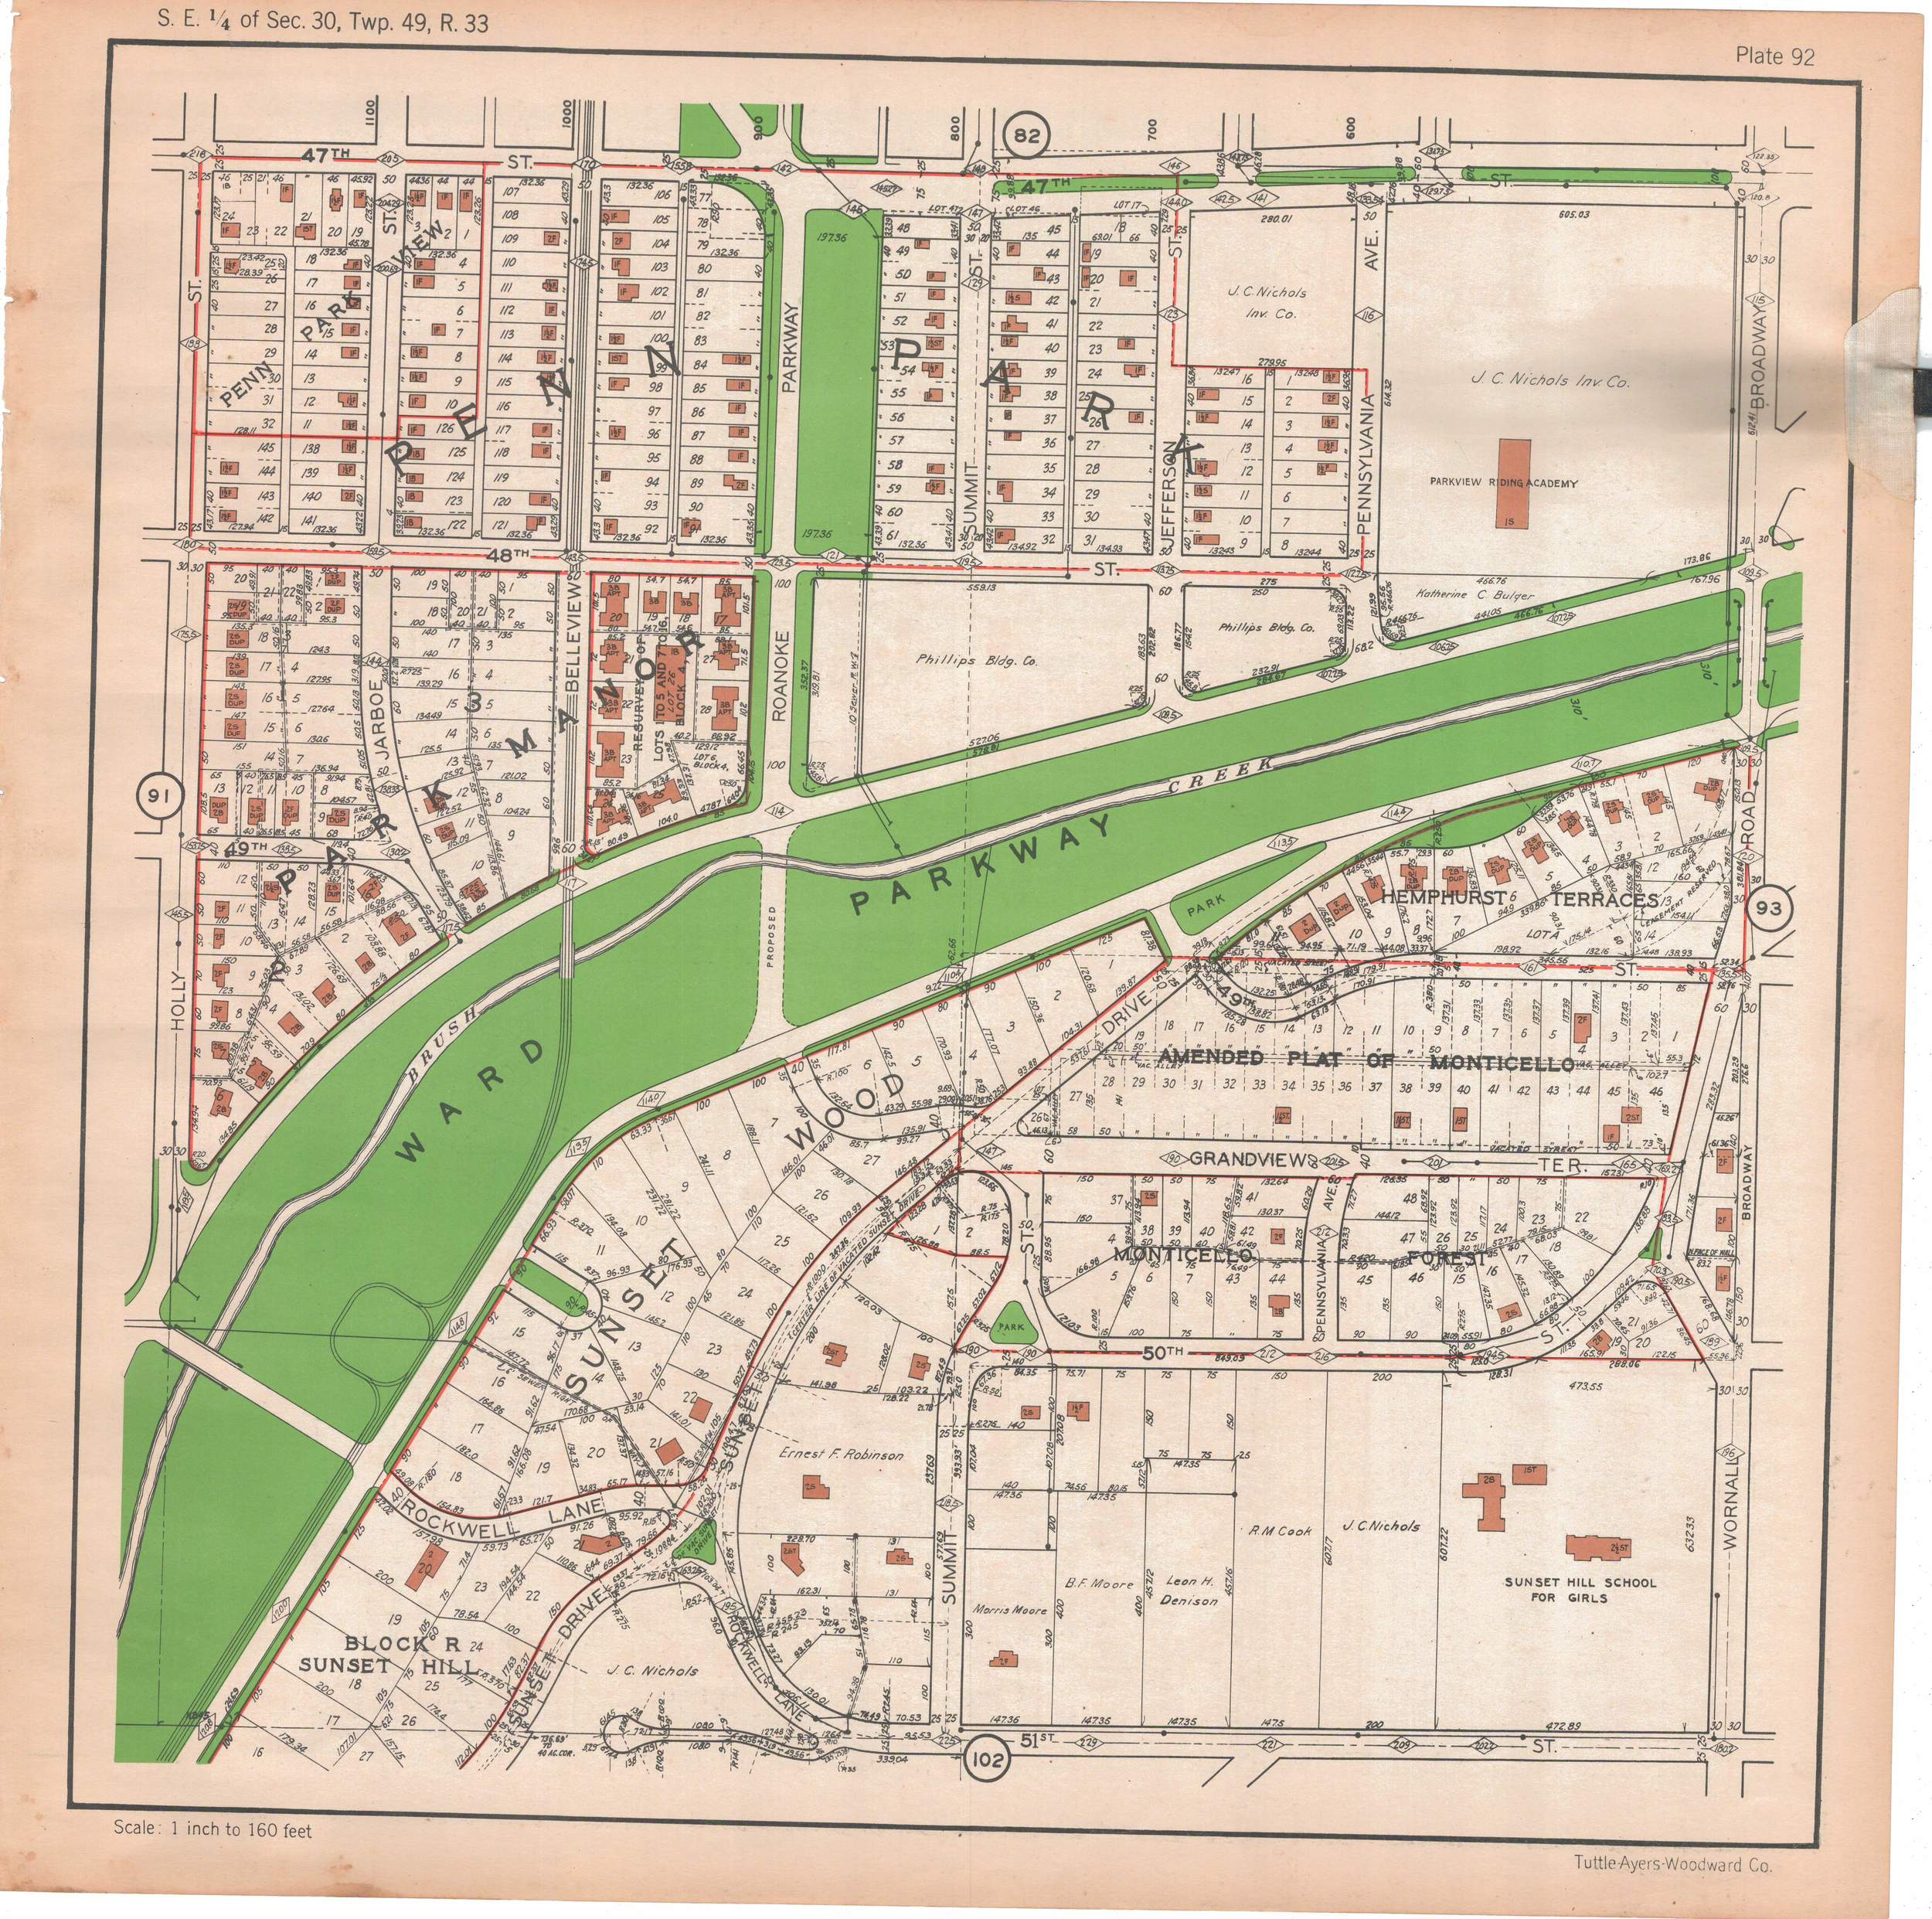 1925 TUTTLE_AYERS_Plate 92.JPG